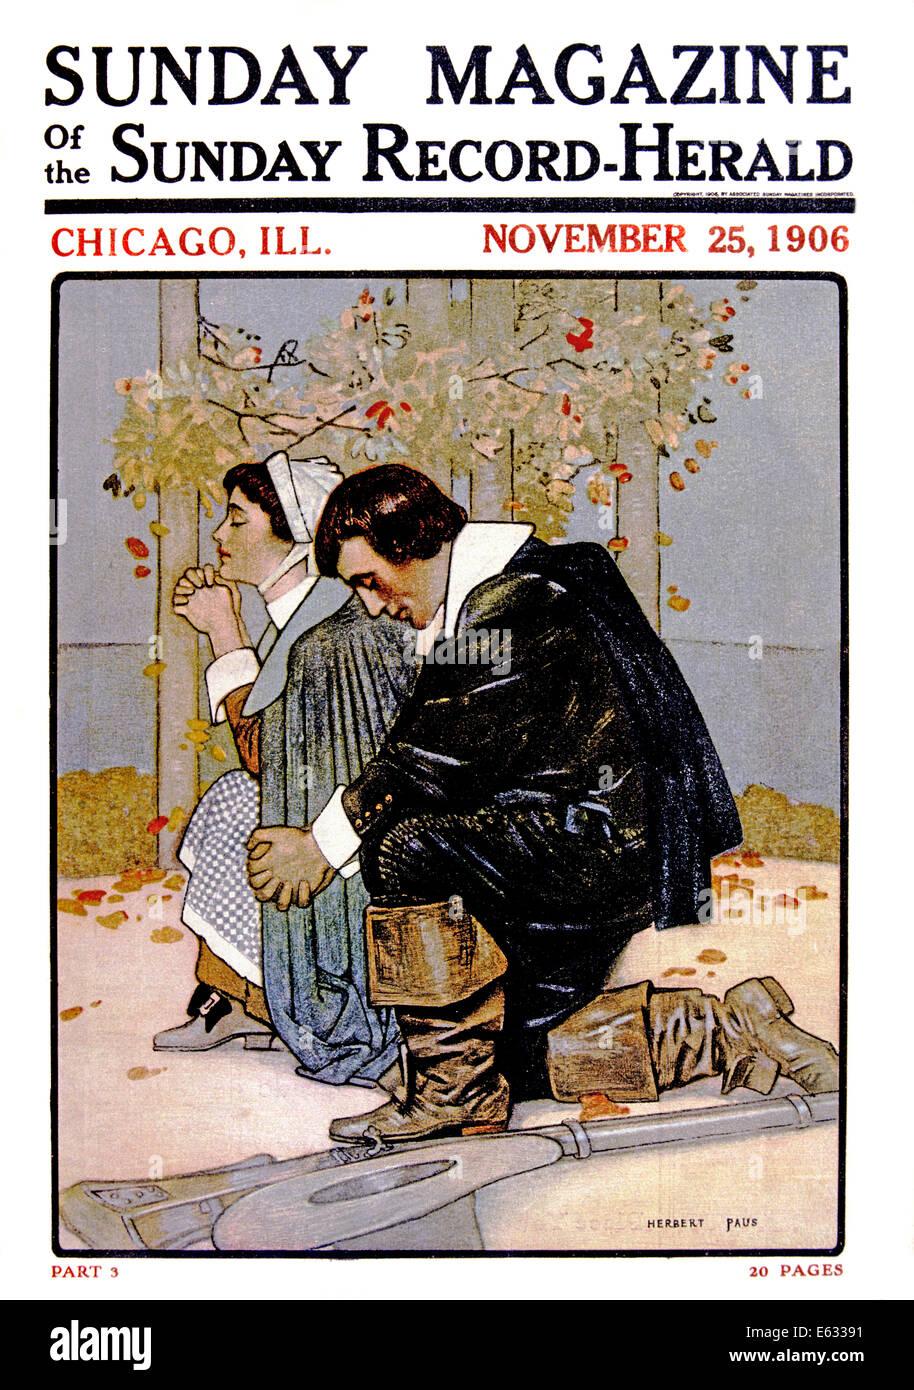 1600s PILGRIM COUPLE KNEELING IN PRAYER 1906 MAGAZINE  ILLUSTRATION - Stock Image